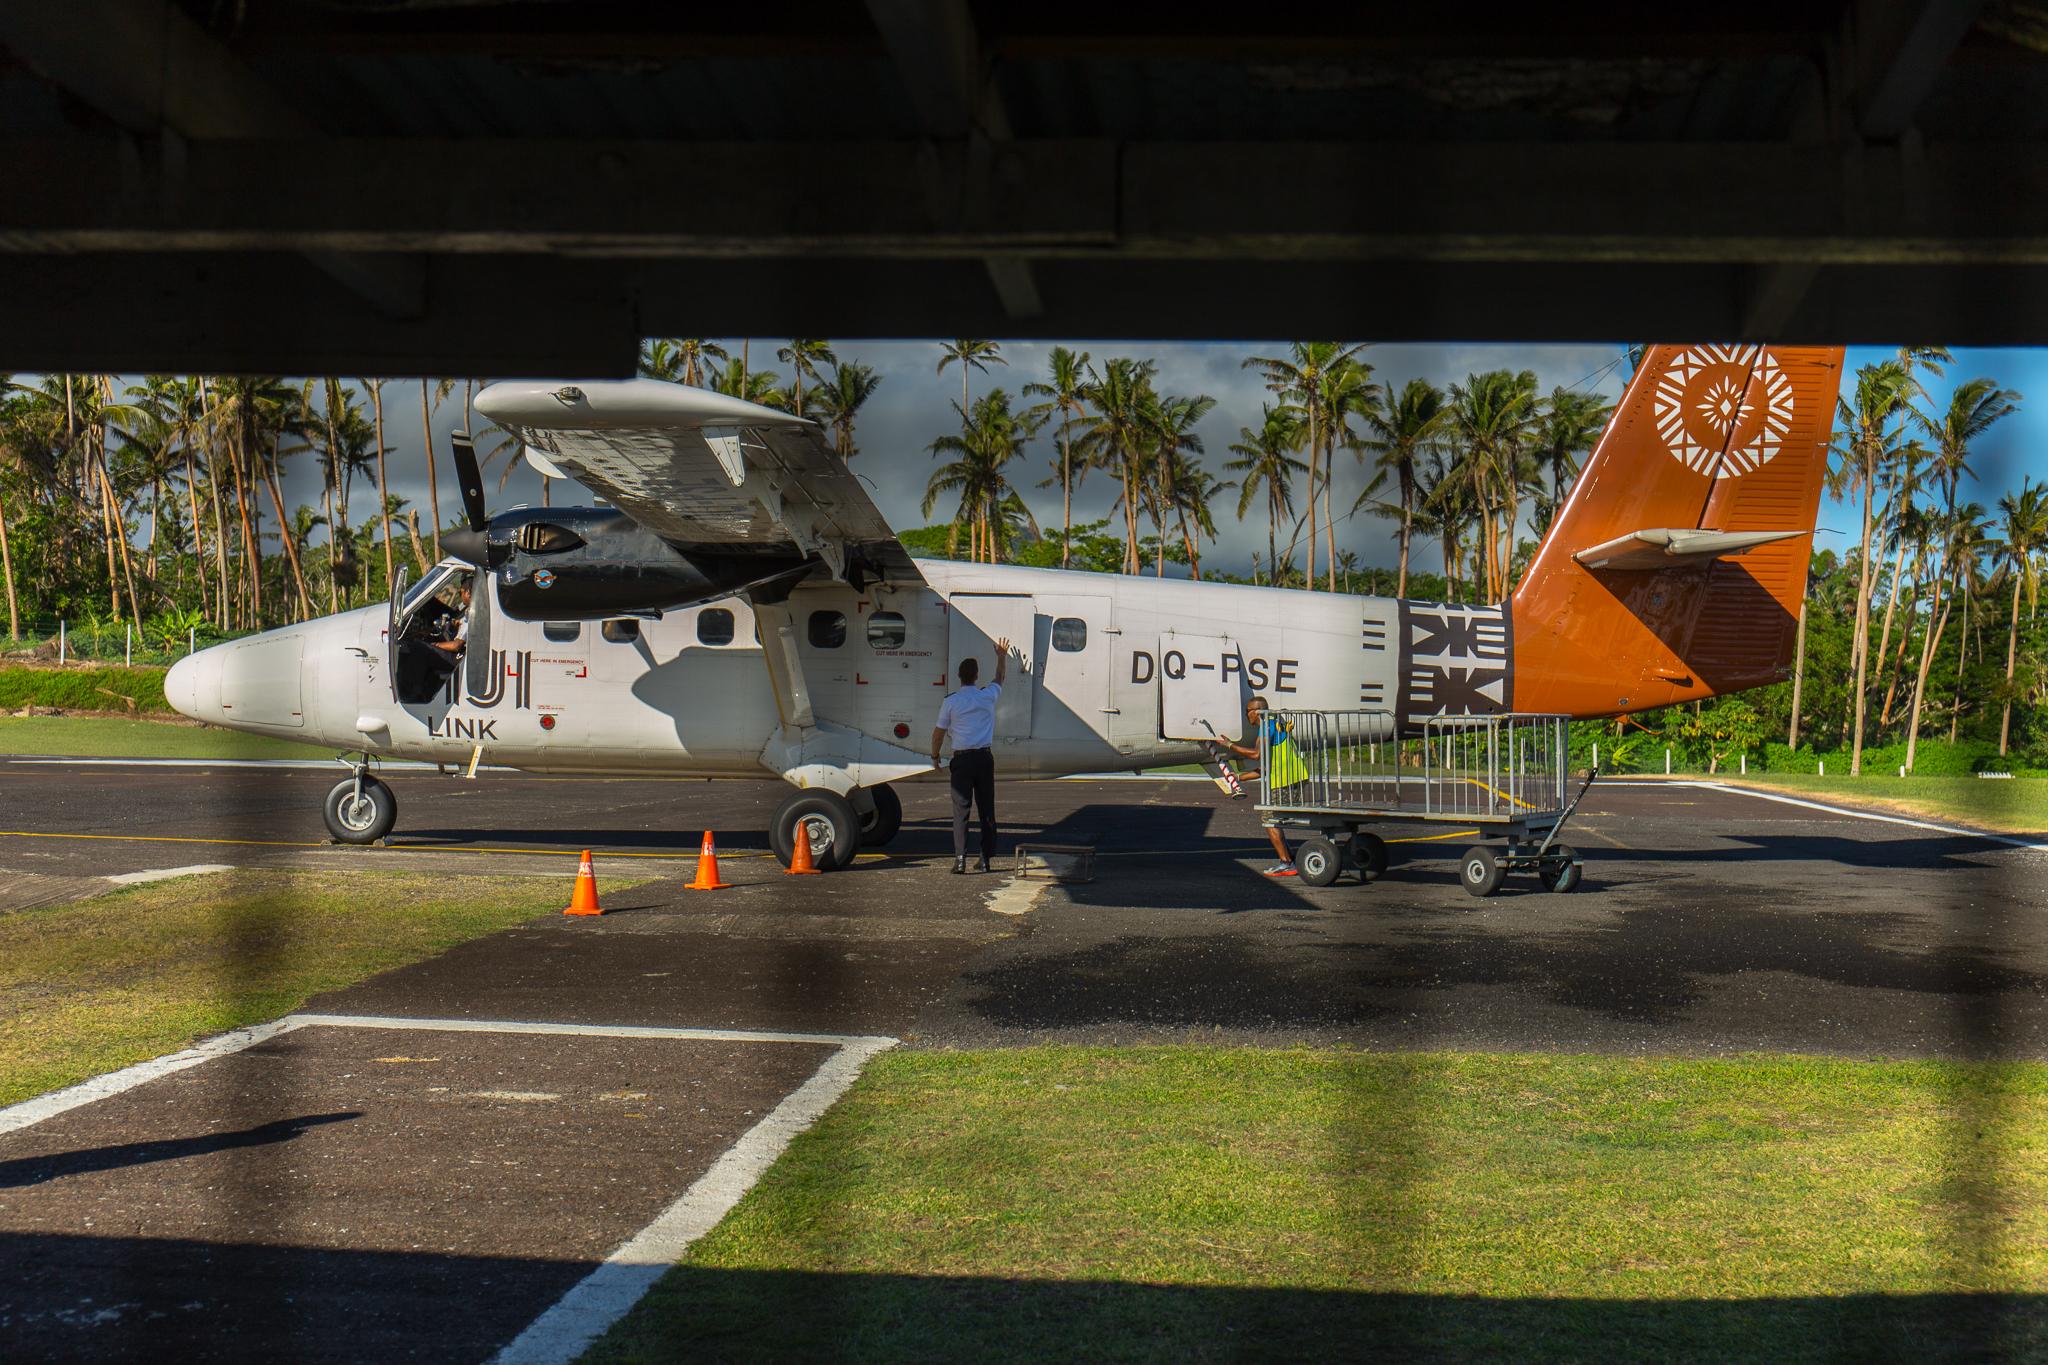 Taveuni island airport